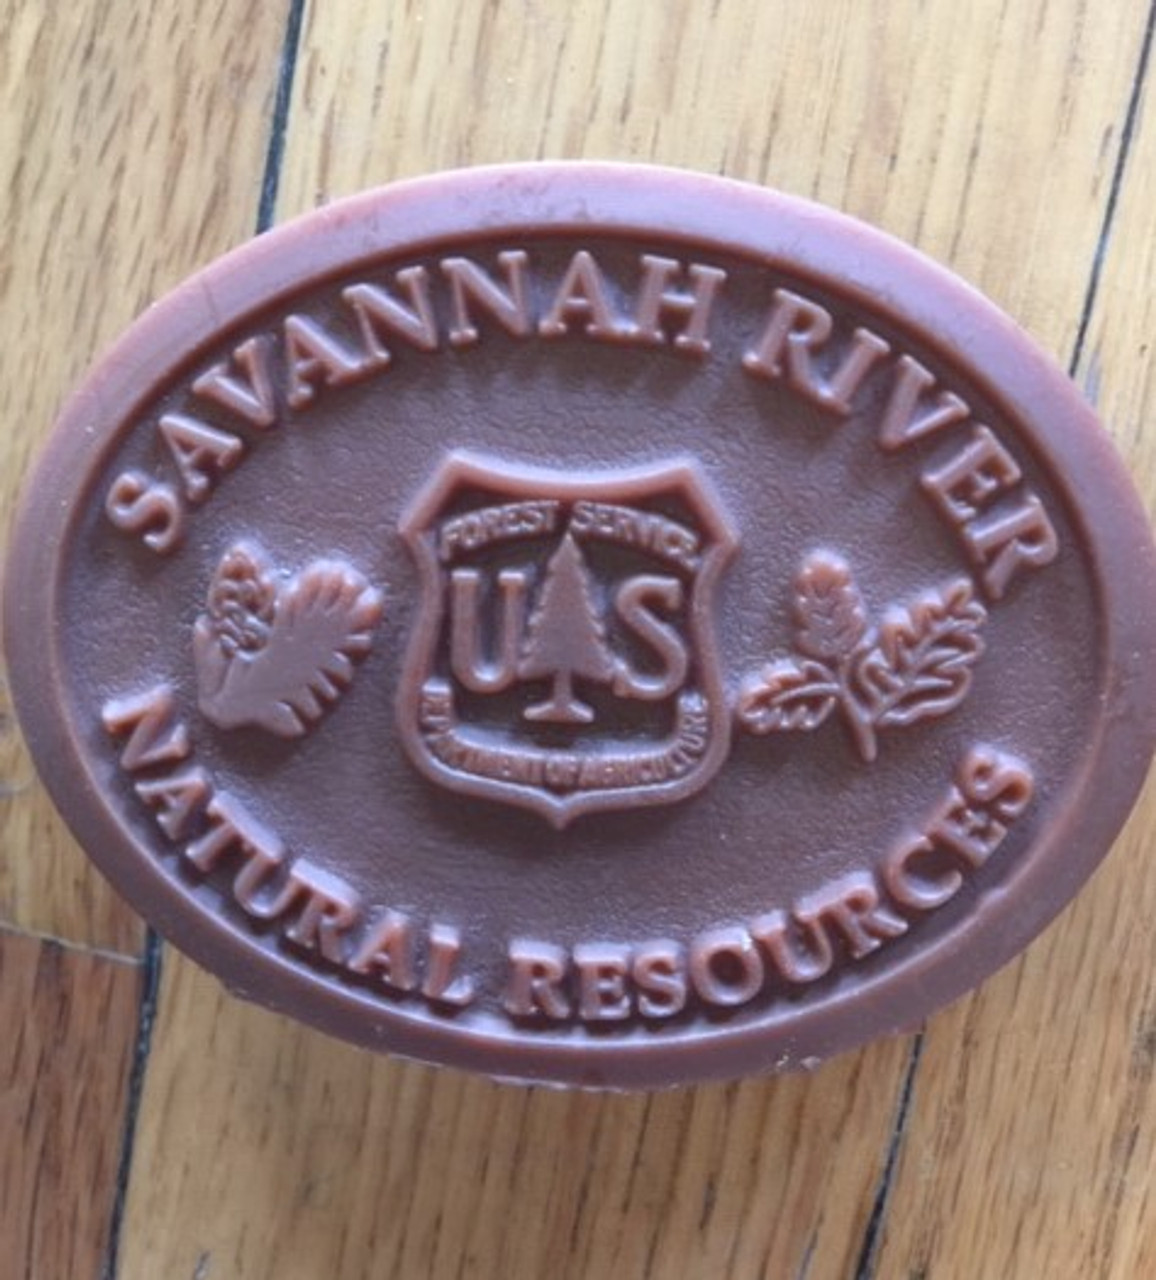 Savannah River Natural Resources Buckle